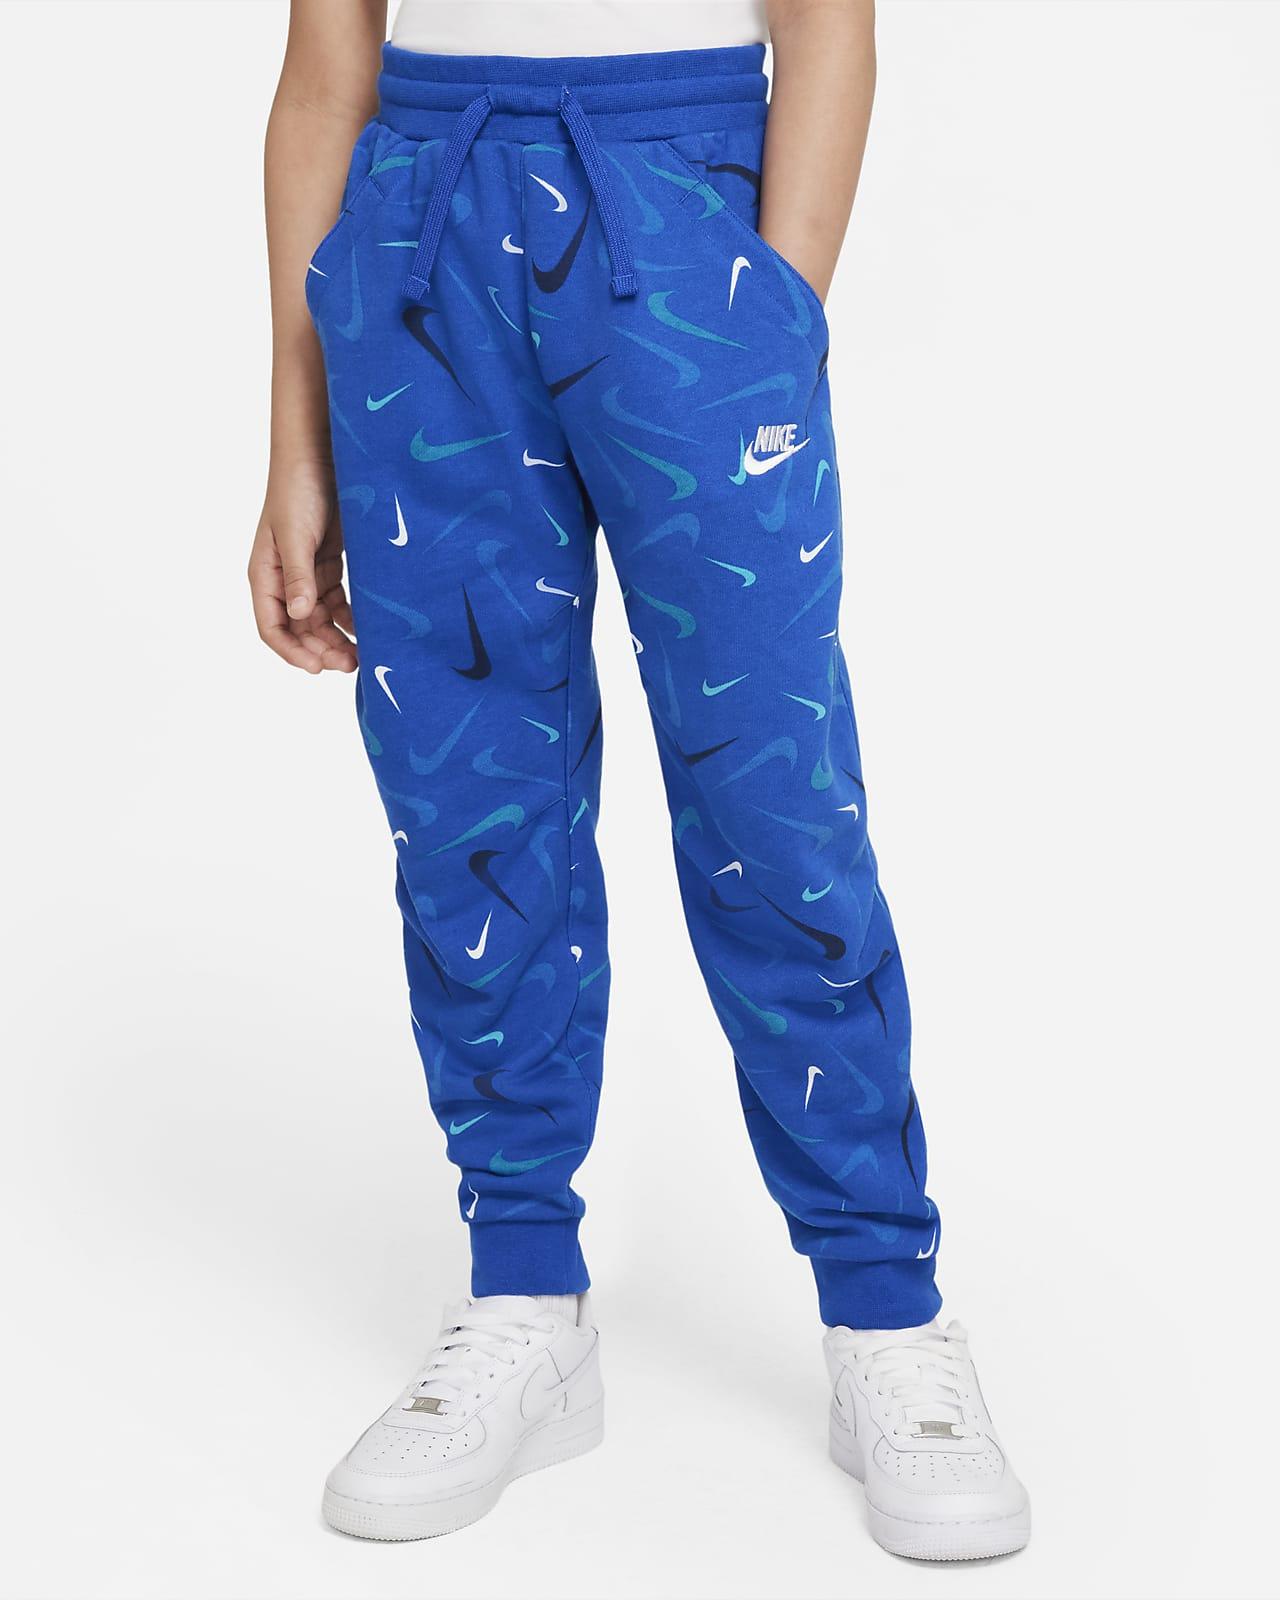 Nike Sportswear Club Big Kids' (Boys') French Terry Printed Joggers